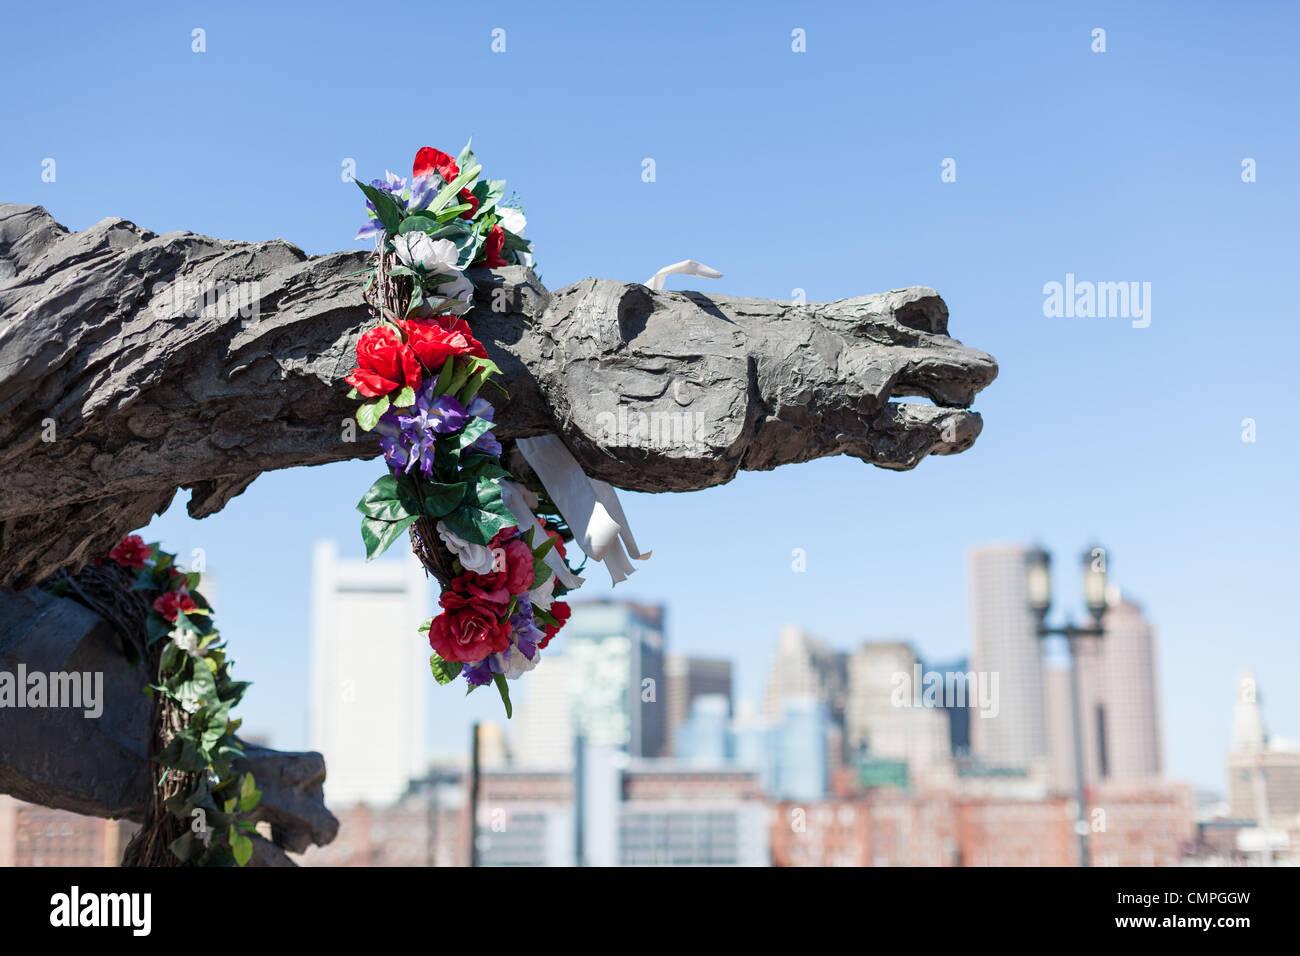 Andrew Pitynski Partisans Statue at World Trade Station in Boston Massachussetts - Stock Image